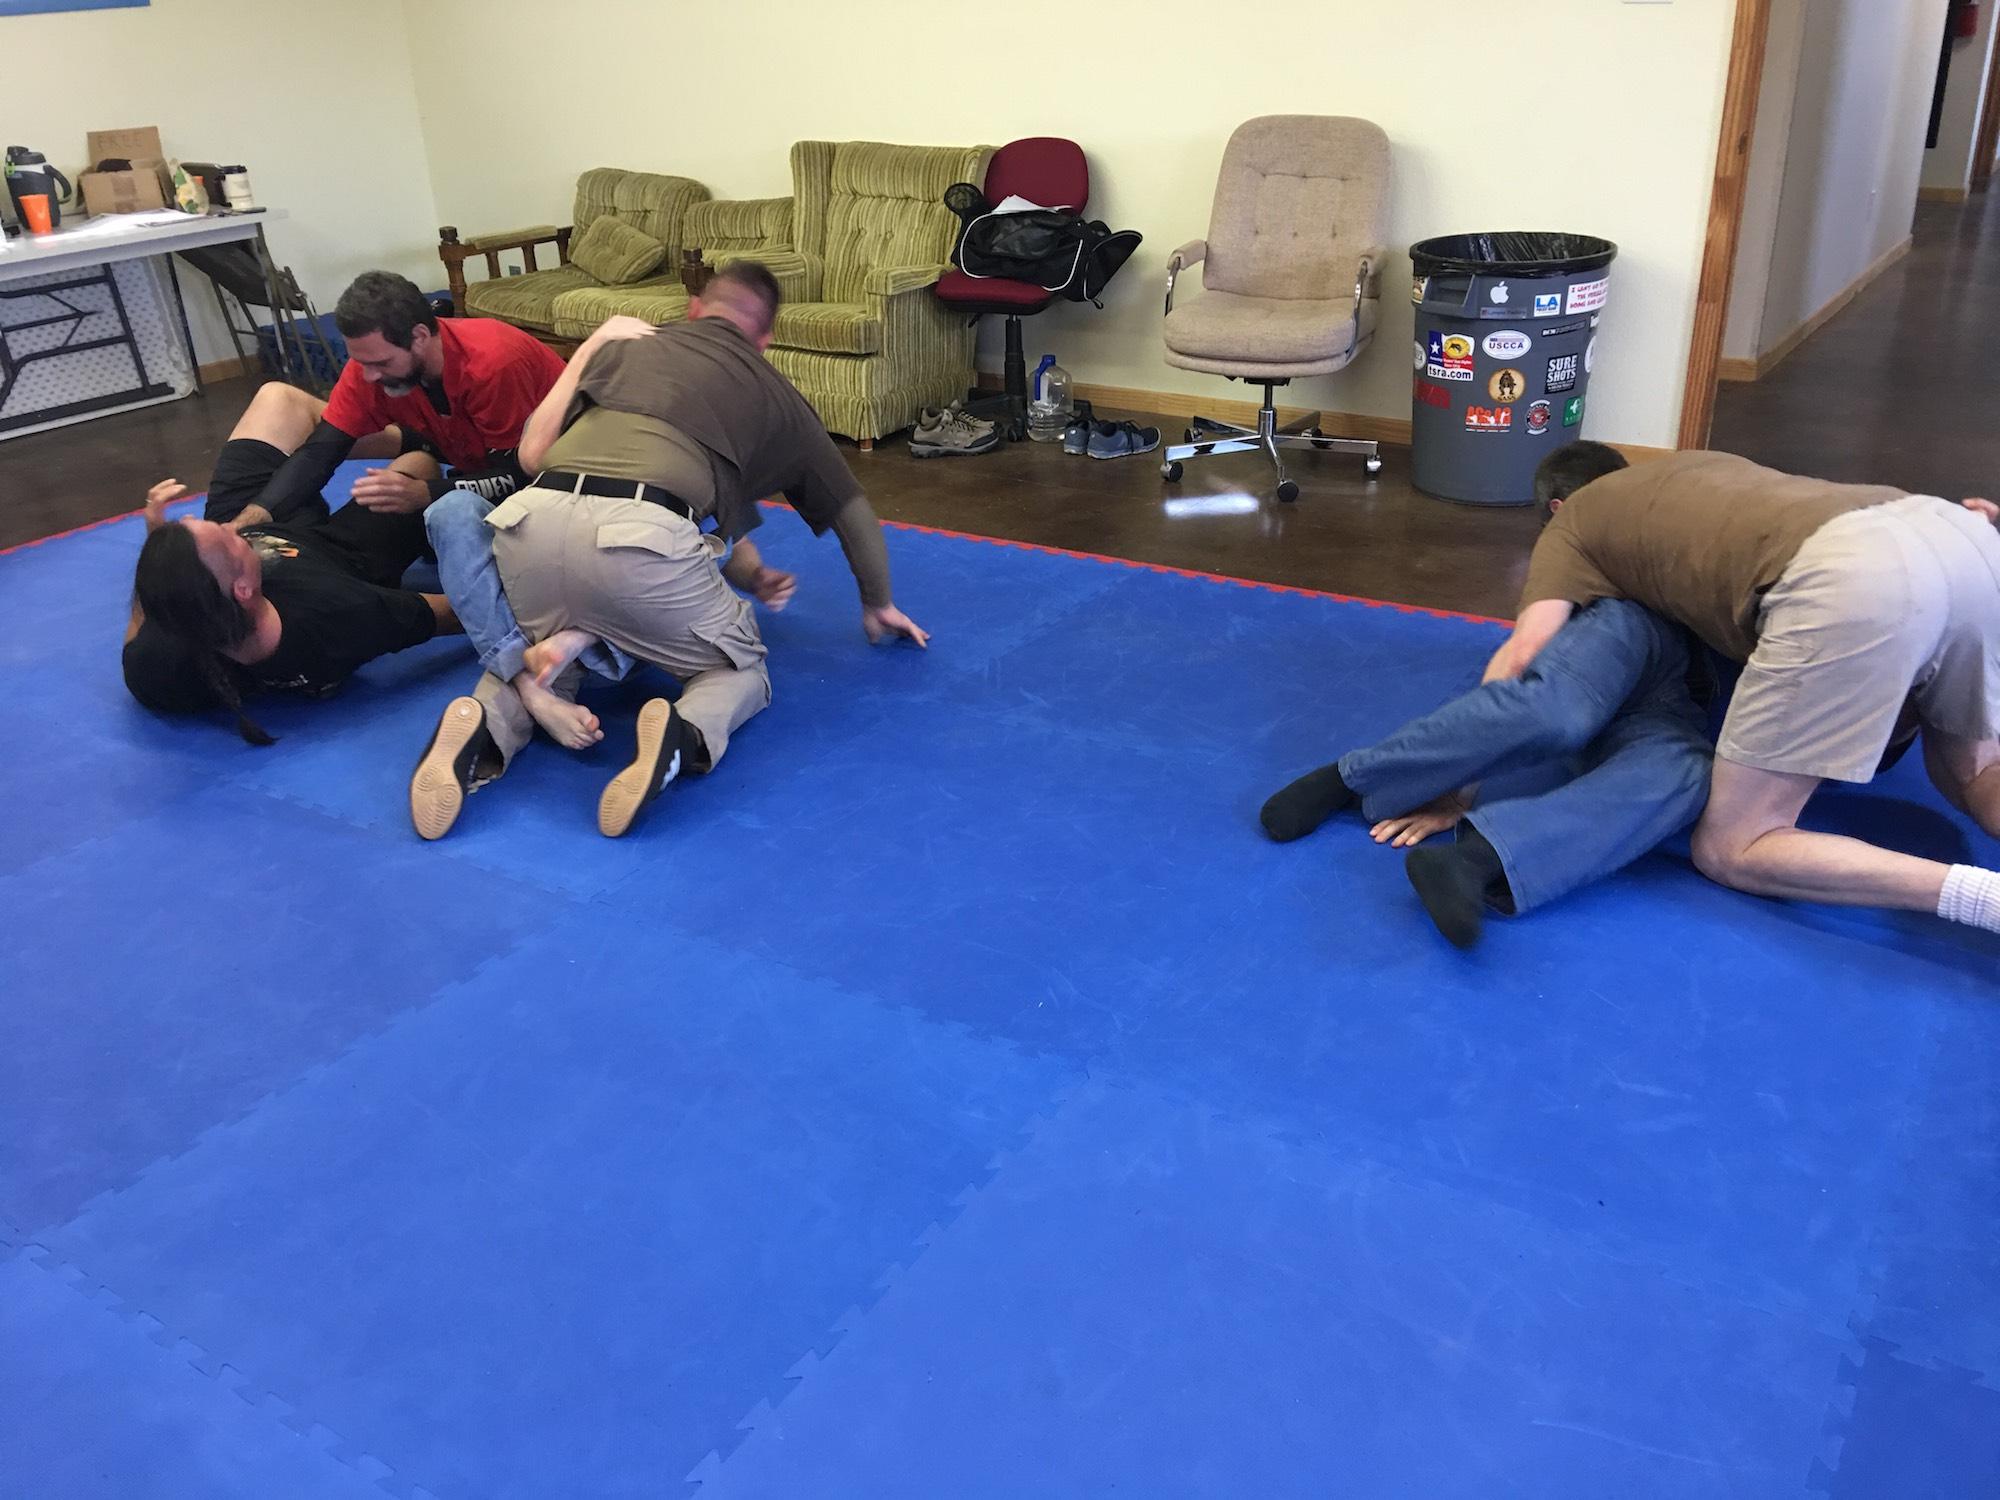 Immediate Action Jiu-Jitsu class at KR Training, Feb. 2017. I'm on far left, ground.